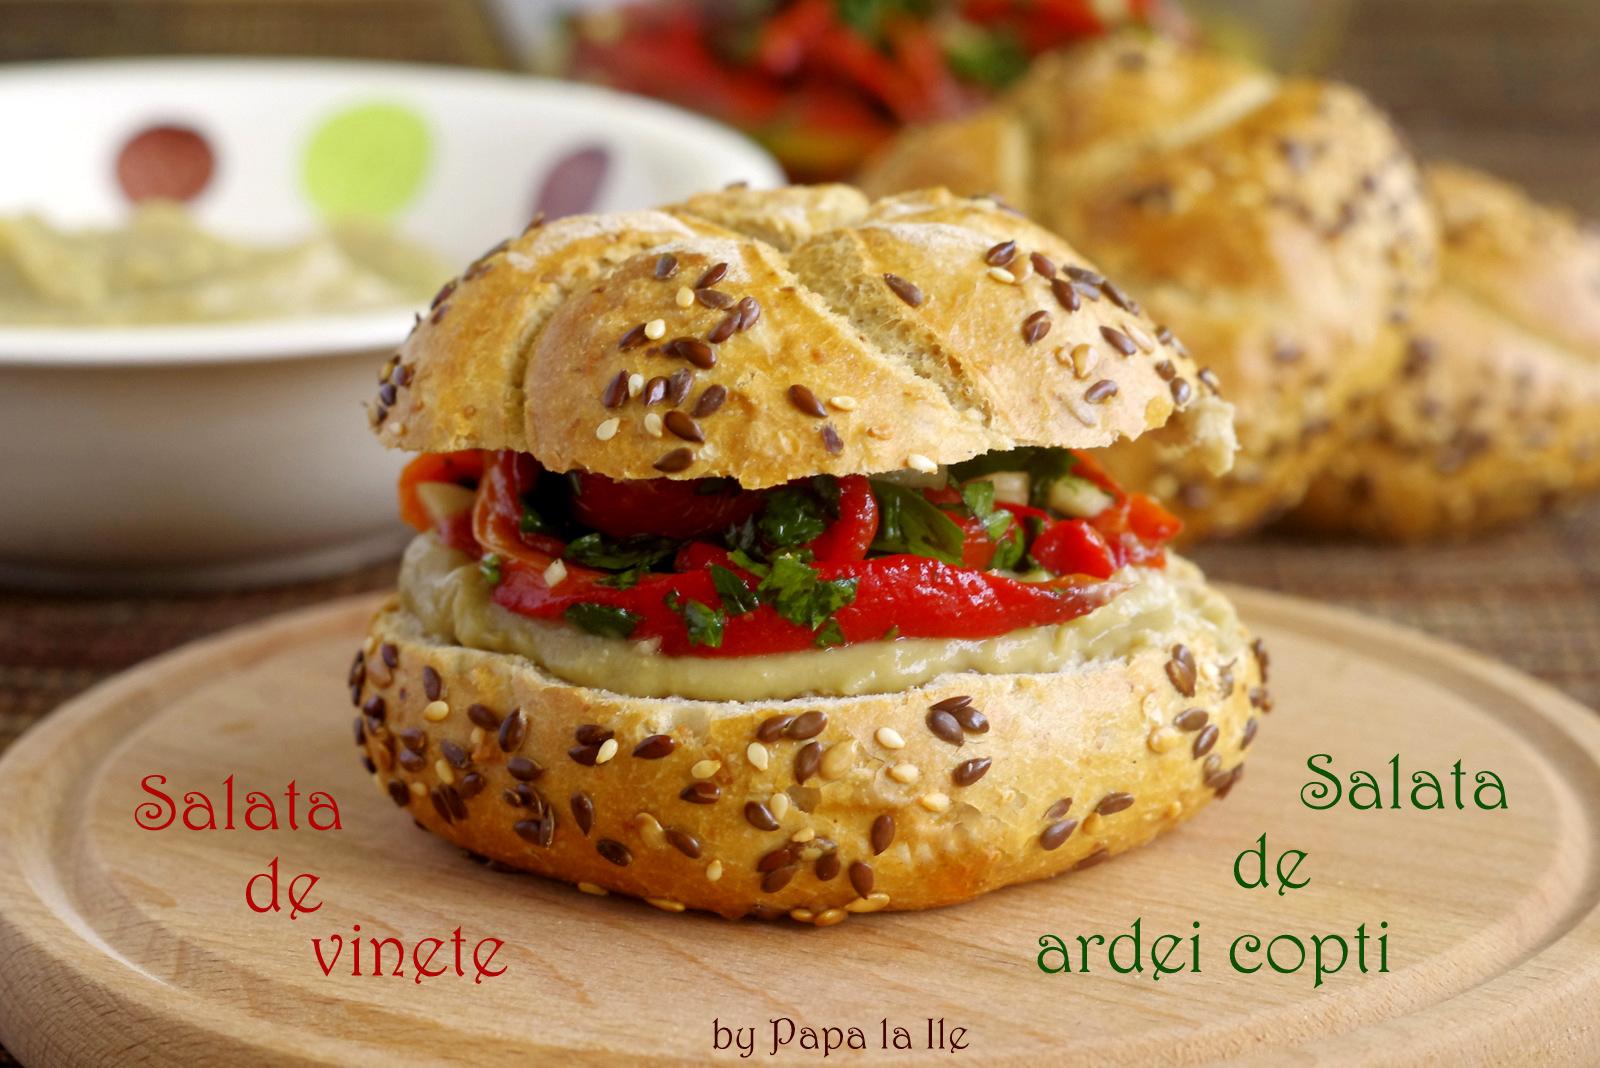 Salata de vinete, salata de ardei copti (7)